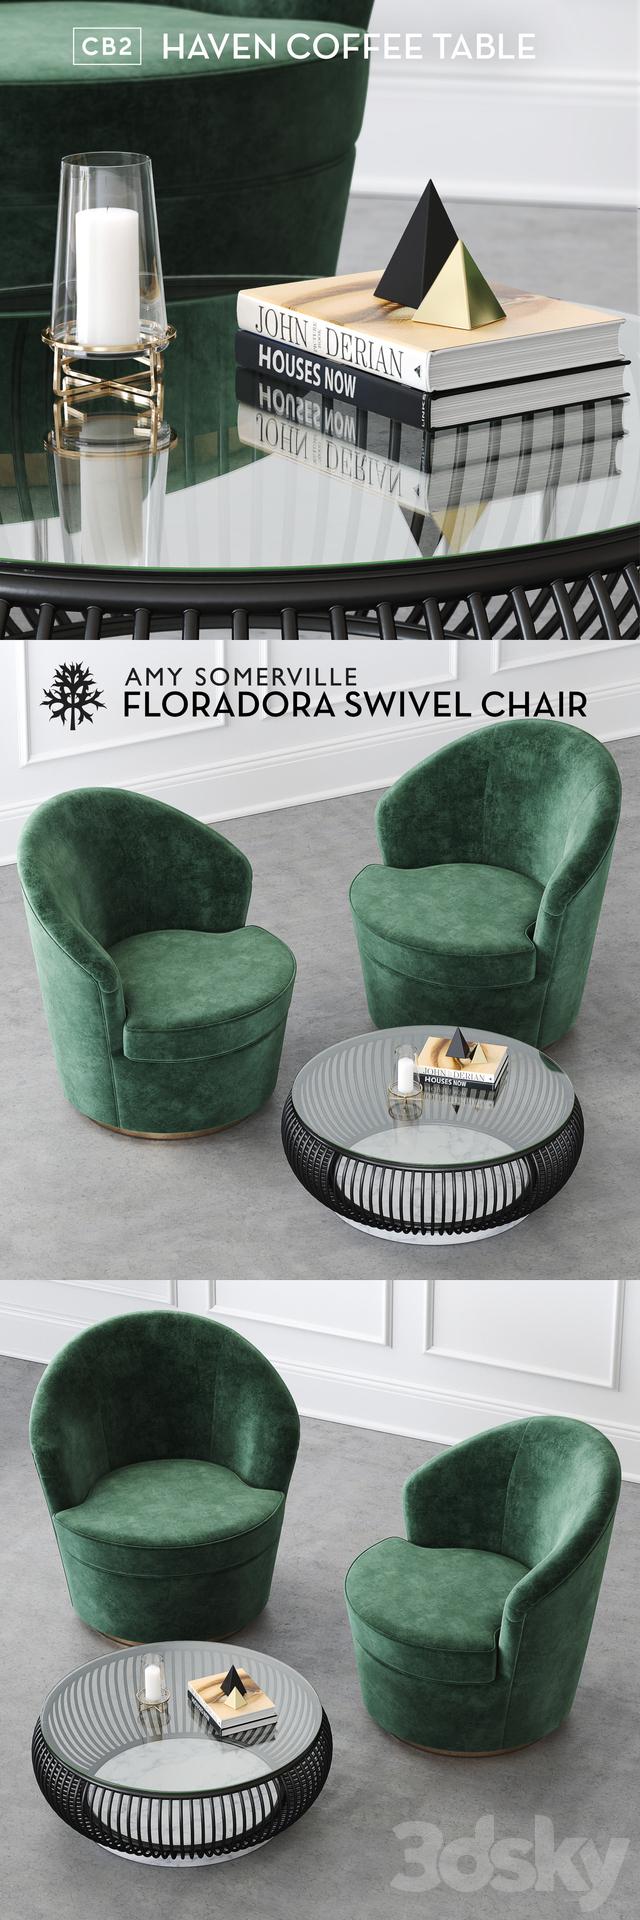 D Models Arm Chair Floradora Swivel Chair - Cb2 haven coffee table